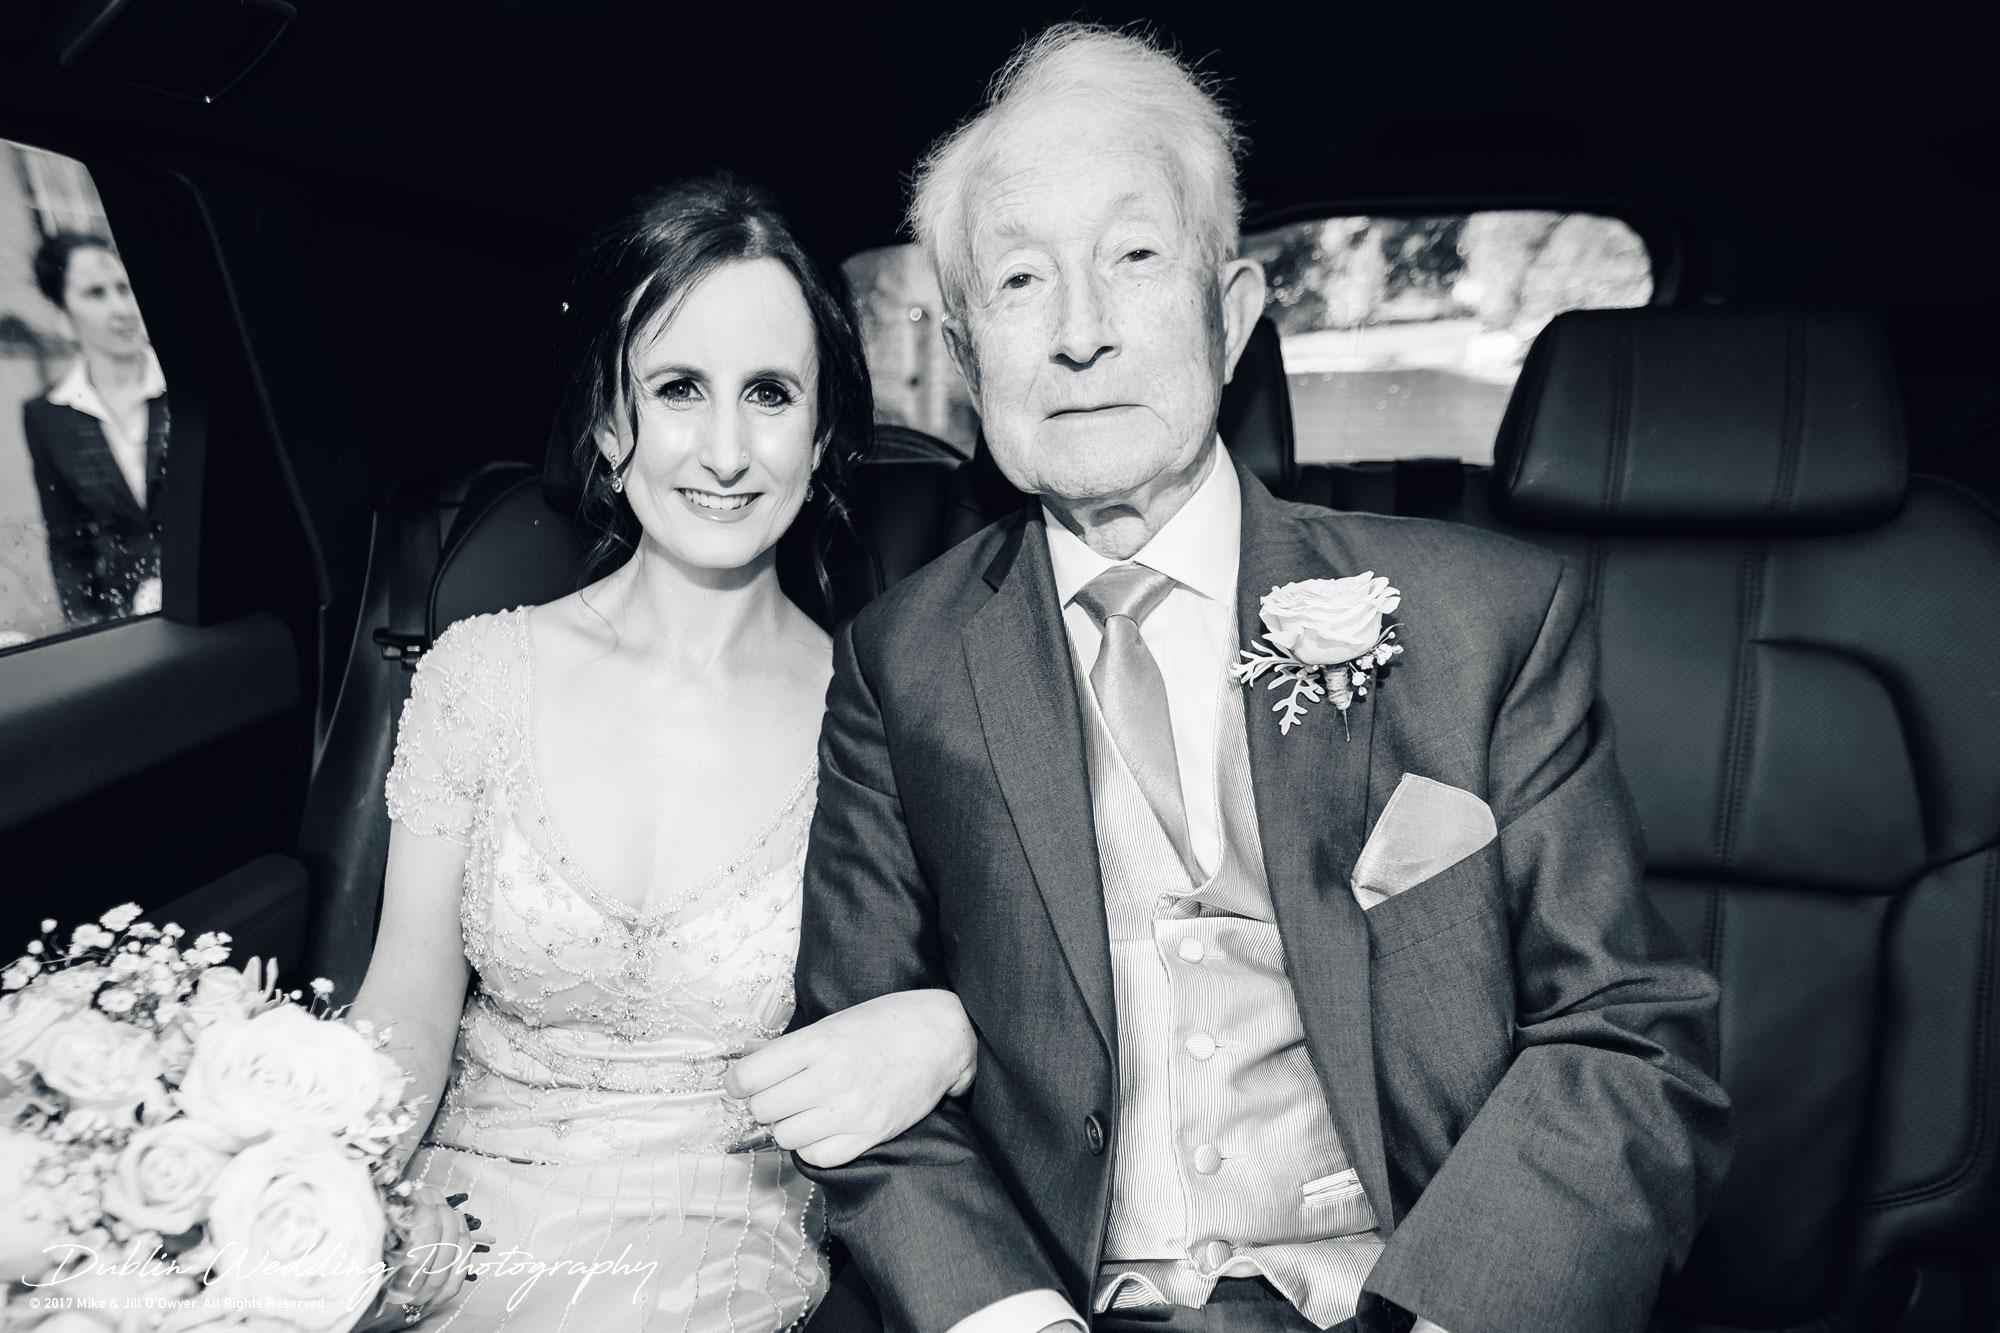 Bellingham Castle, Wedding Photographer, Louth, Dublin, Bride & Father in Car